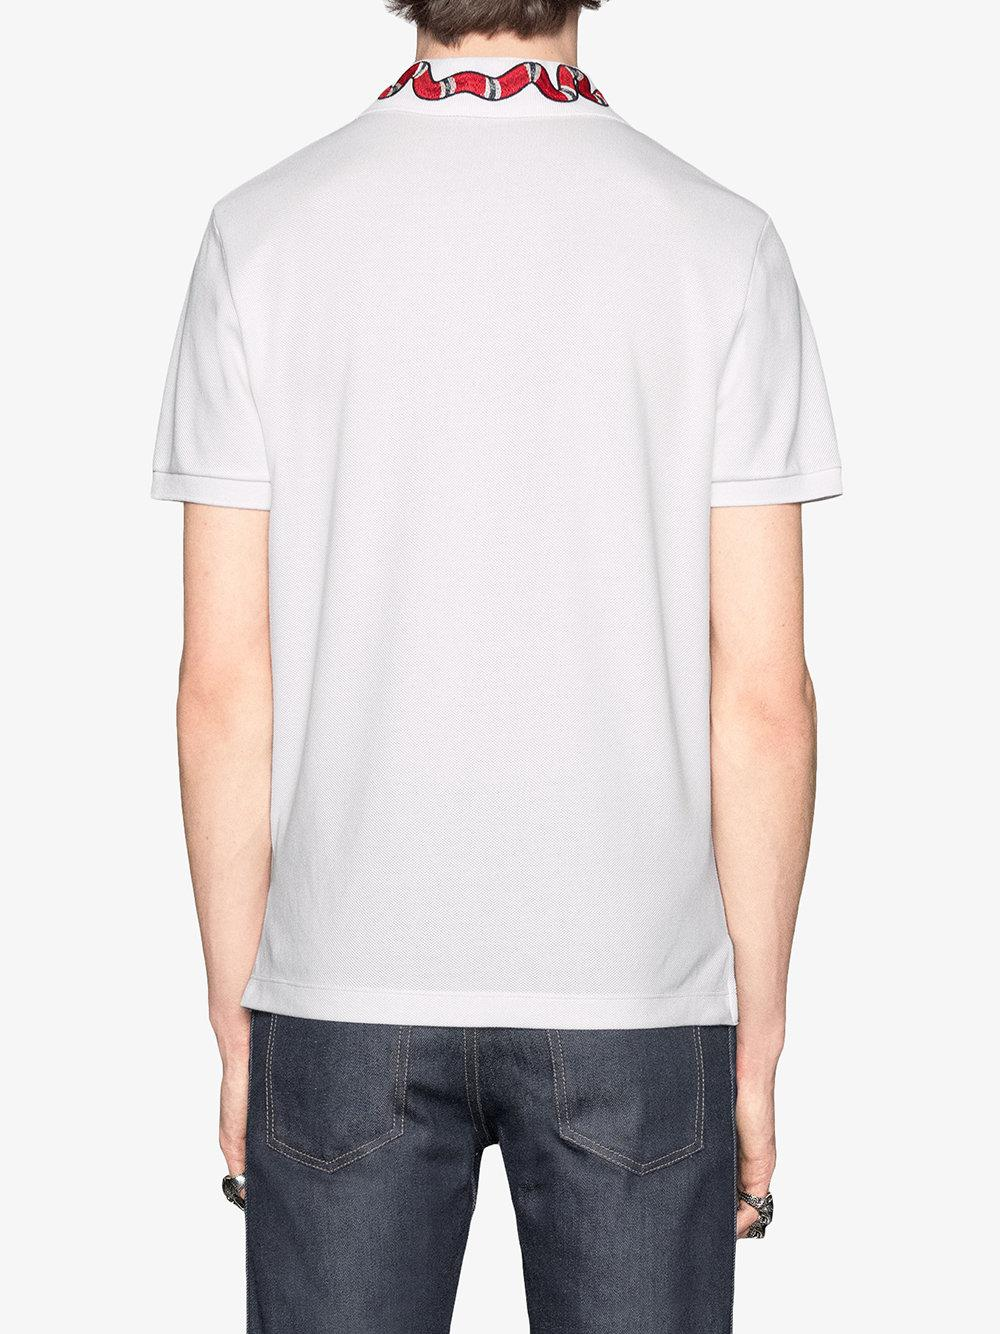 2d647959 Gucci - White Kingsnake Embroidered Polo Shirt for Men - Lyst. View  fullscreen